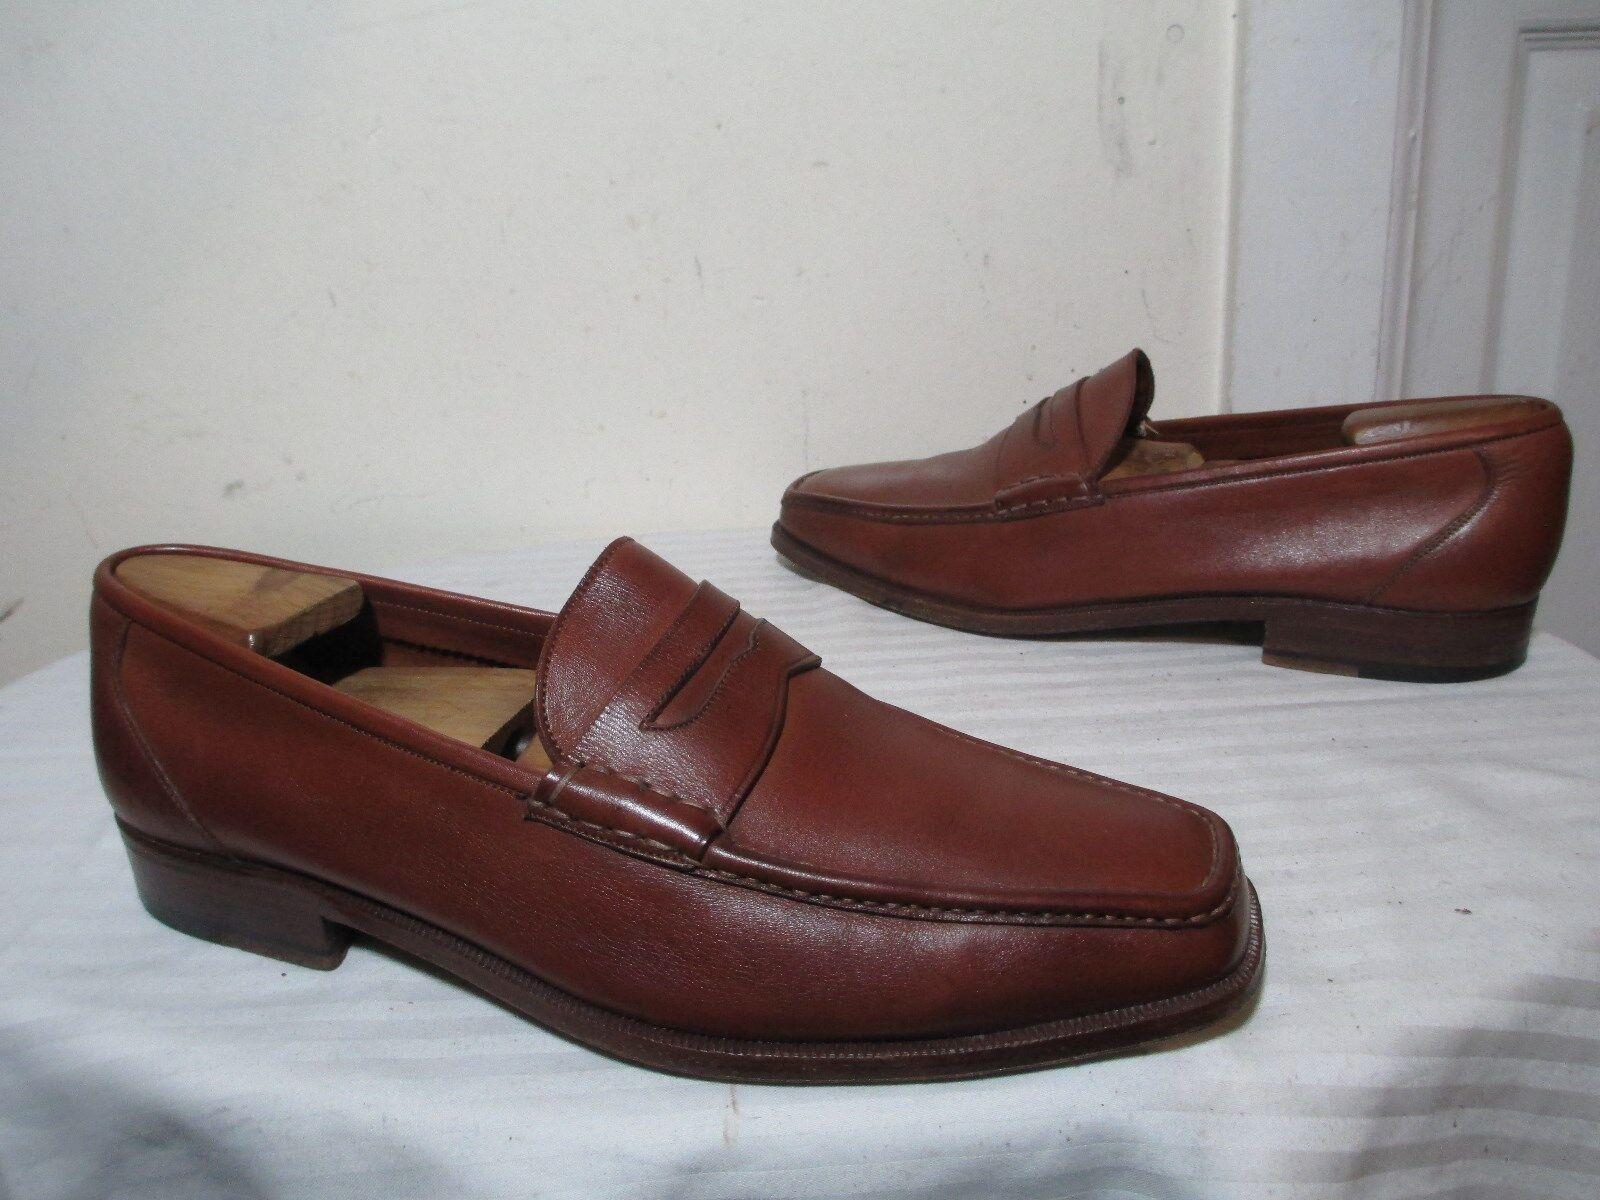 BRUGNOLI Homme en Cuir Marron Slip Ons Penny Mocassin Chaussures Taille 43